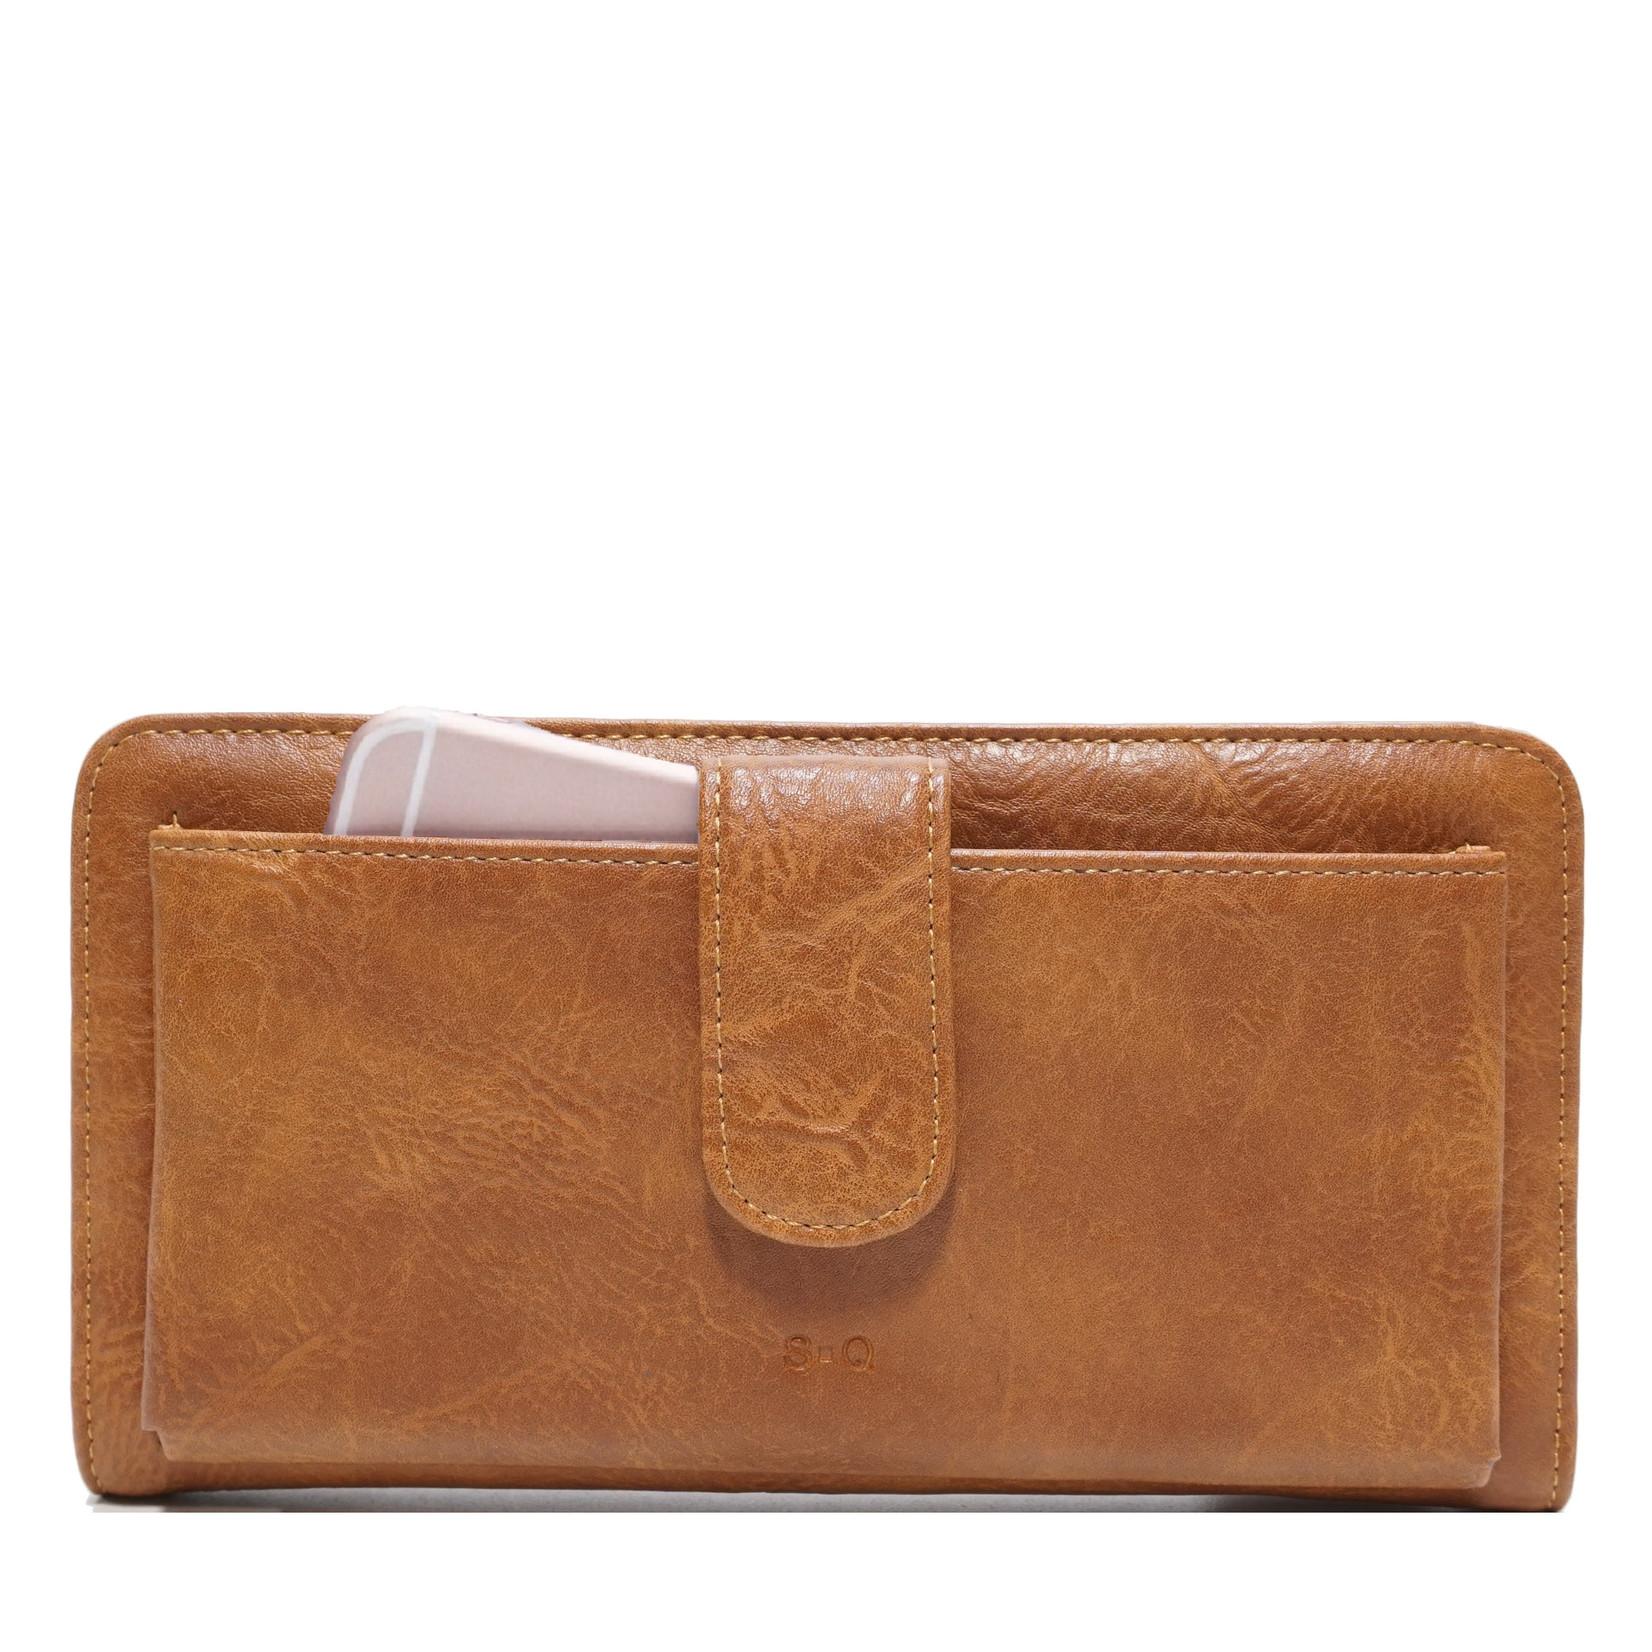 SQ Dona Smartphone Wallet